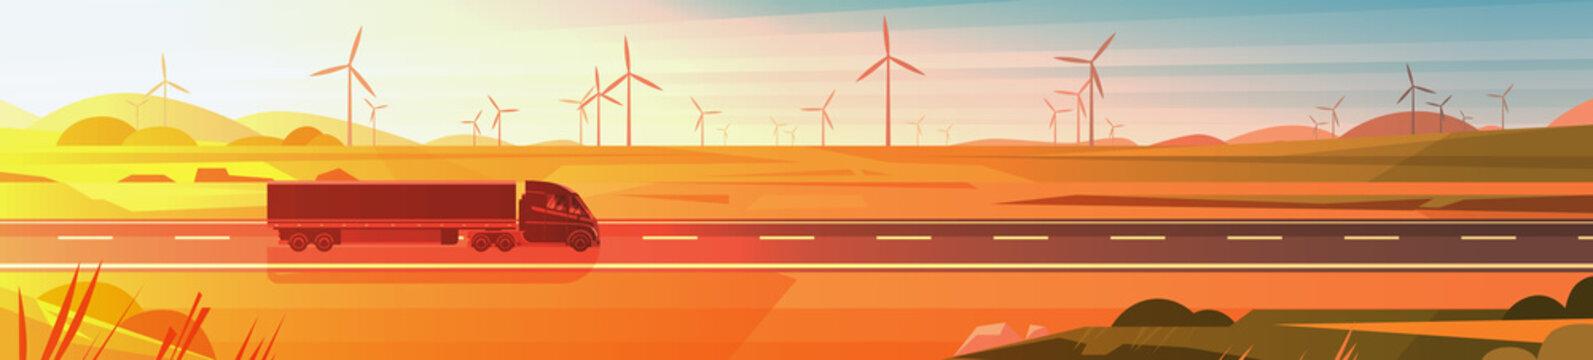 Large Semi Truck Trailer Driving On Road Over Nature Sunset Landscape Horizontal Banner Vector Illustration